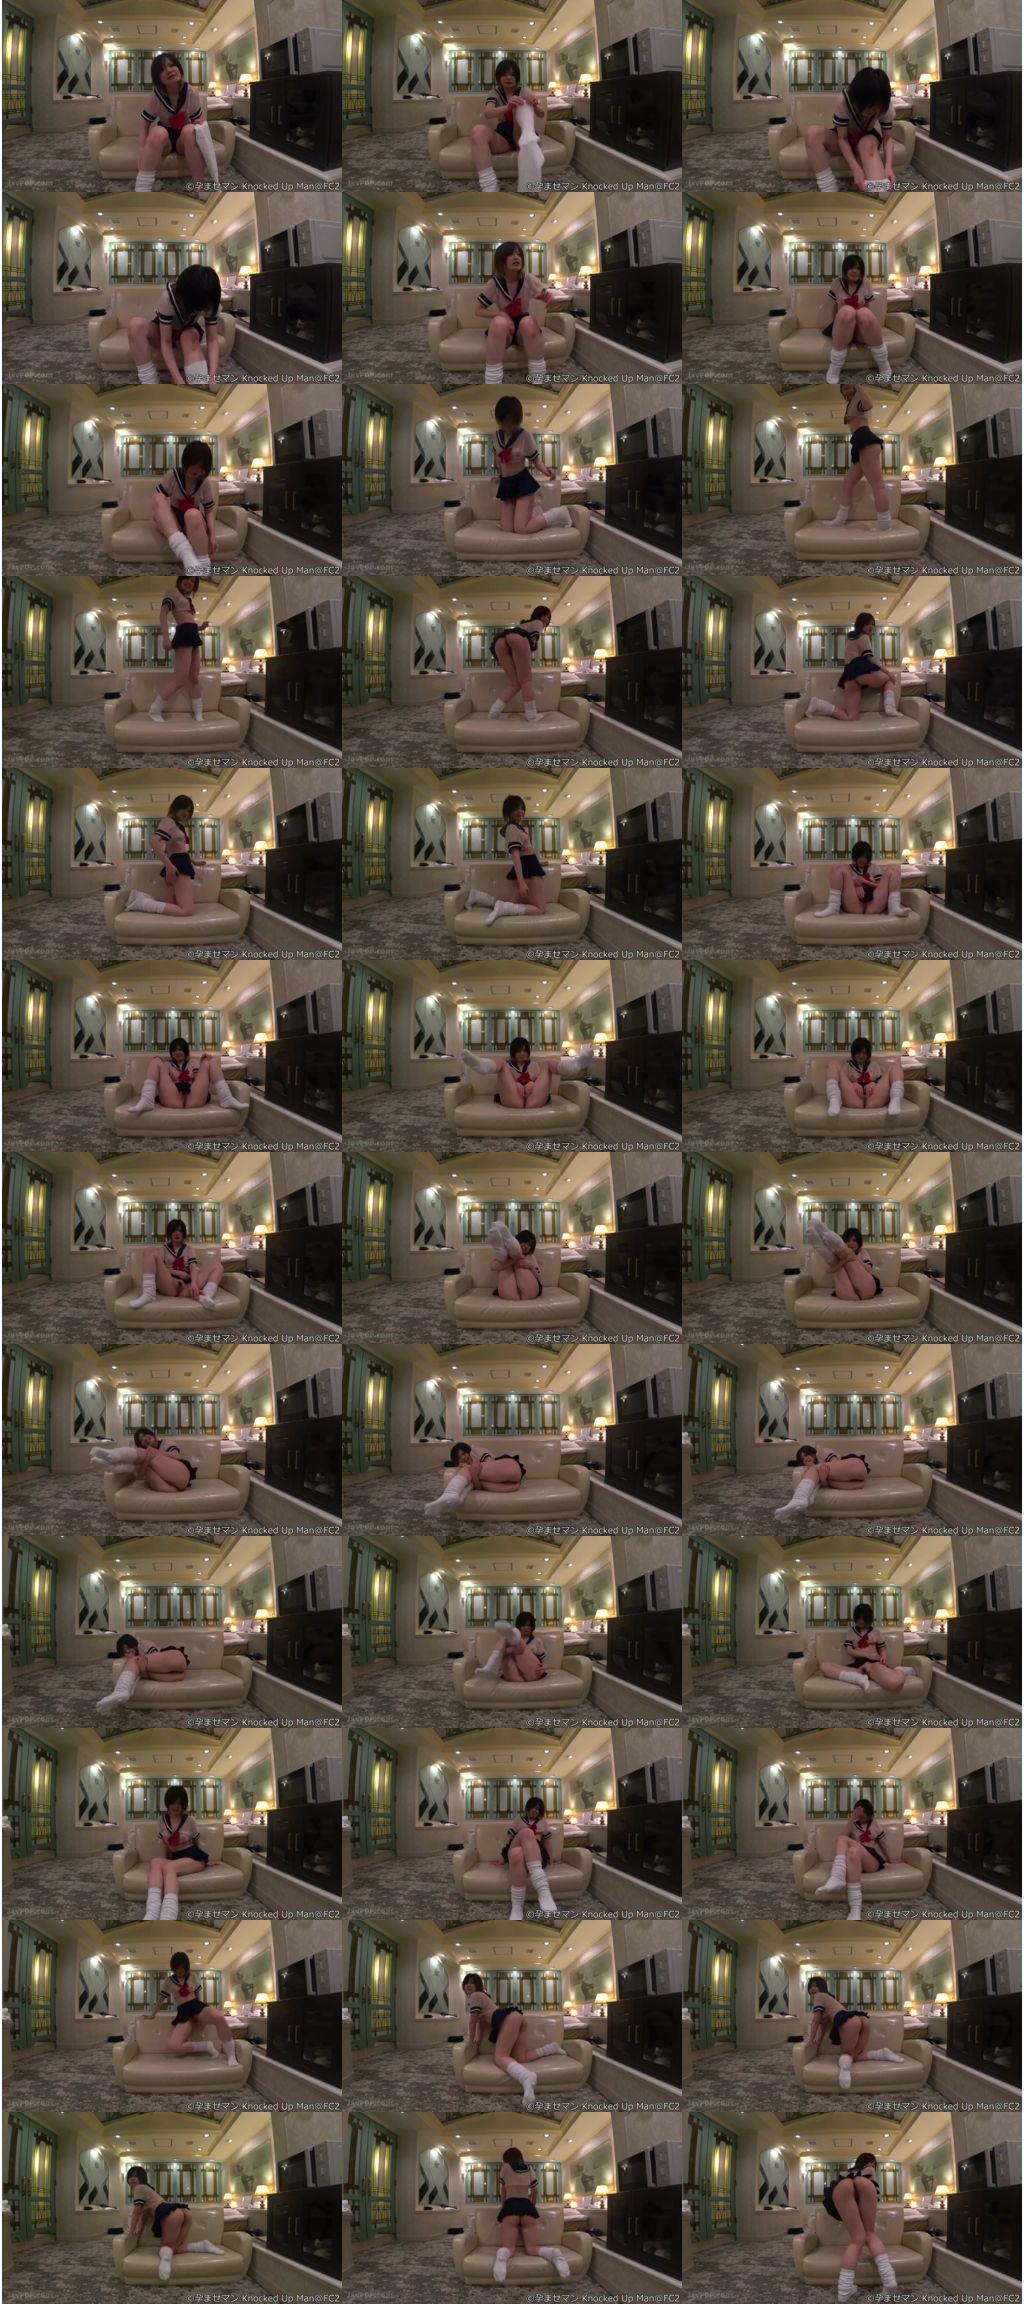 [FC2_PPV-1100216] 【素人動画】161女子大生◯ゆちゃん23歳12回目 超ミニスカルーズのJ系コスで妊娠キメる真正中出し!